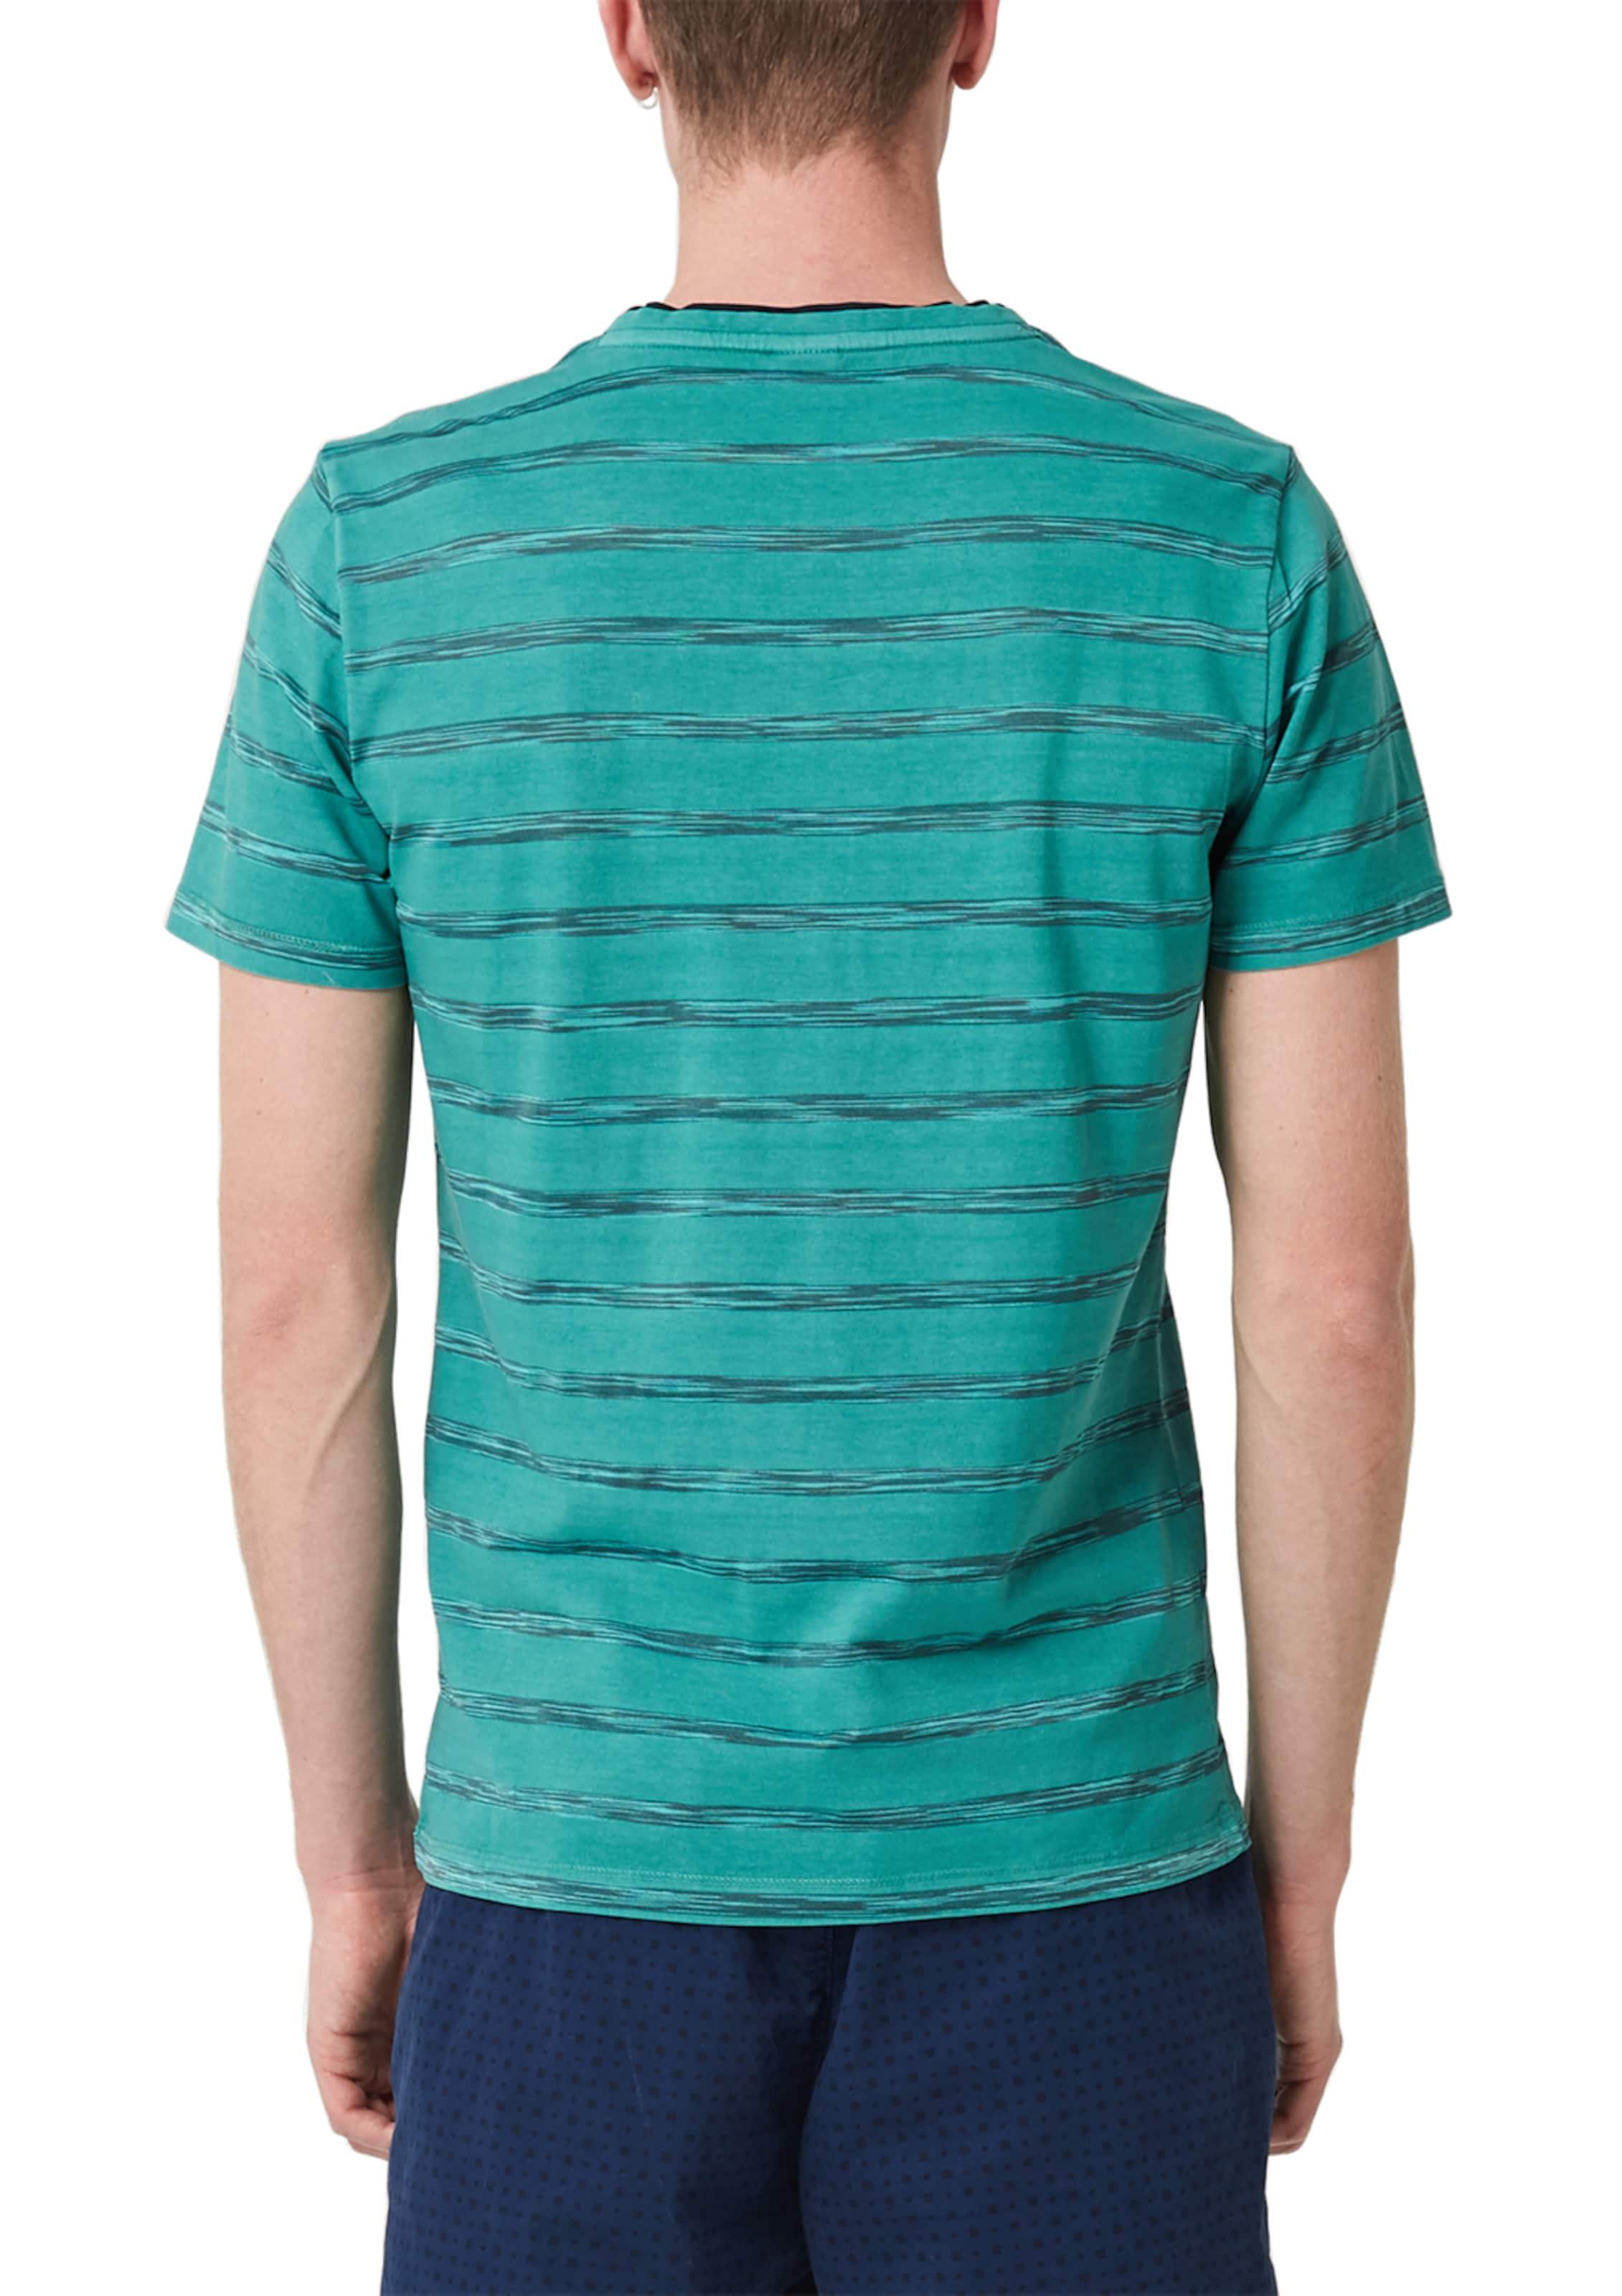 Pastellblau S oliver Shirt Red Label In w8POn0k